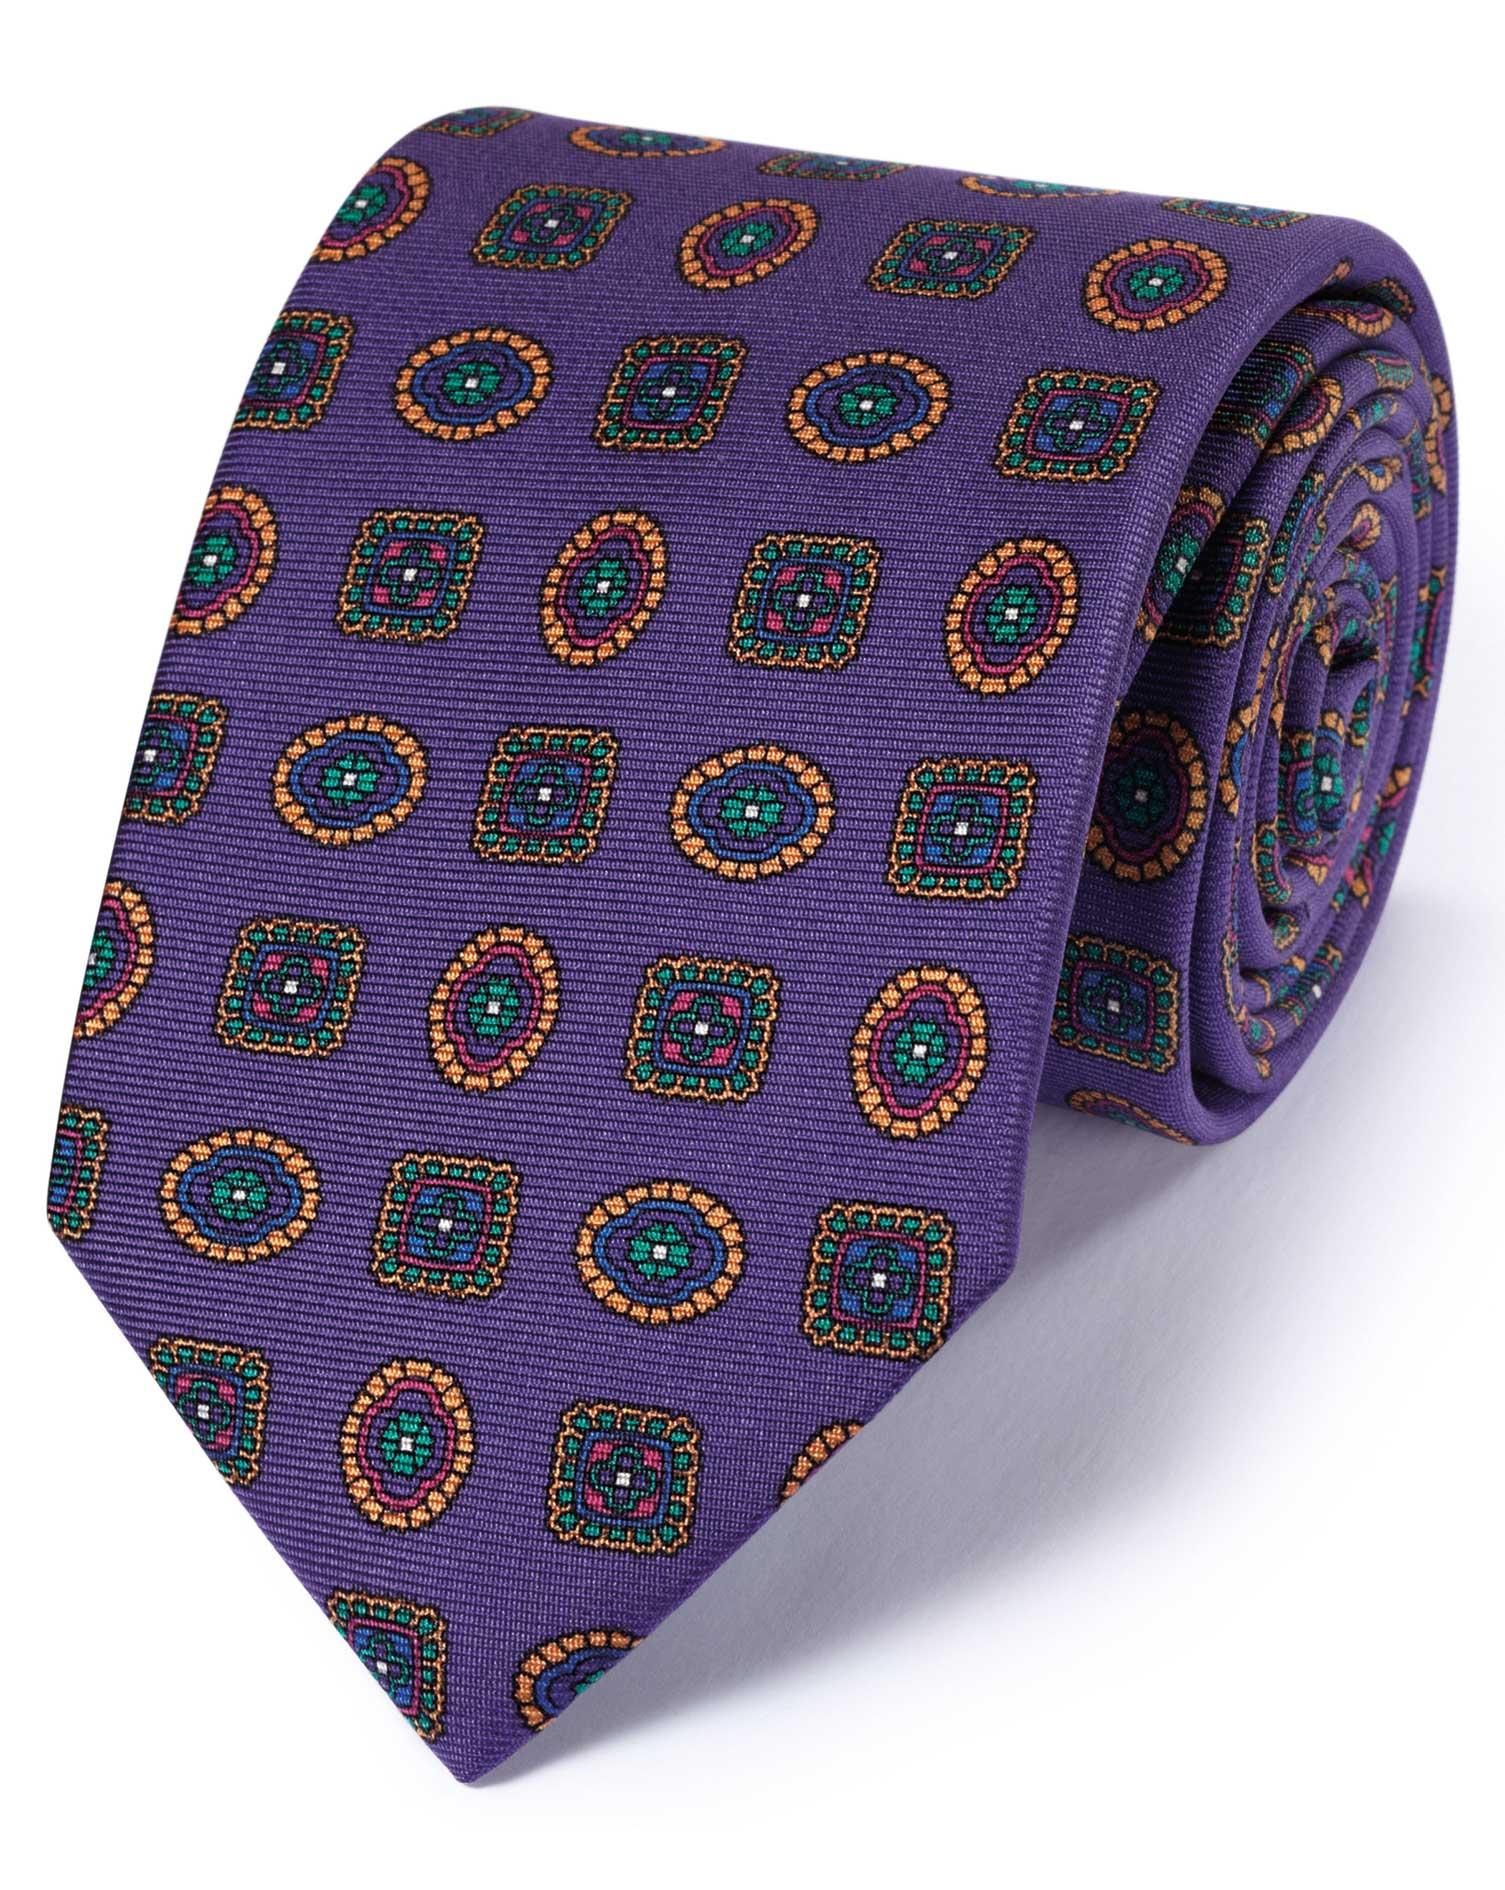 Purple Silk English Luxury Medallion Tie Size OSFA by Charles Tyrwhitt